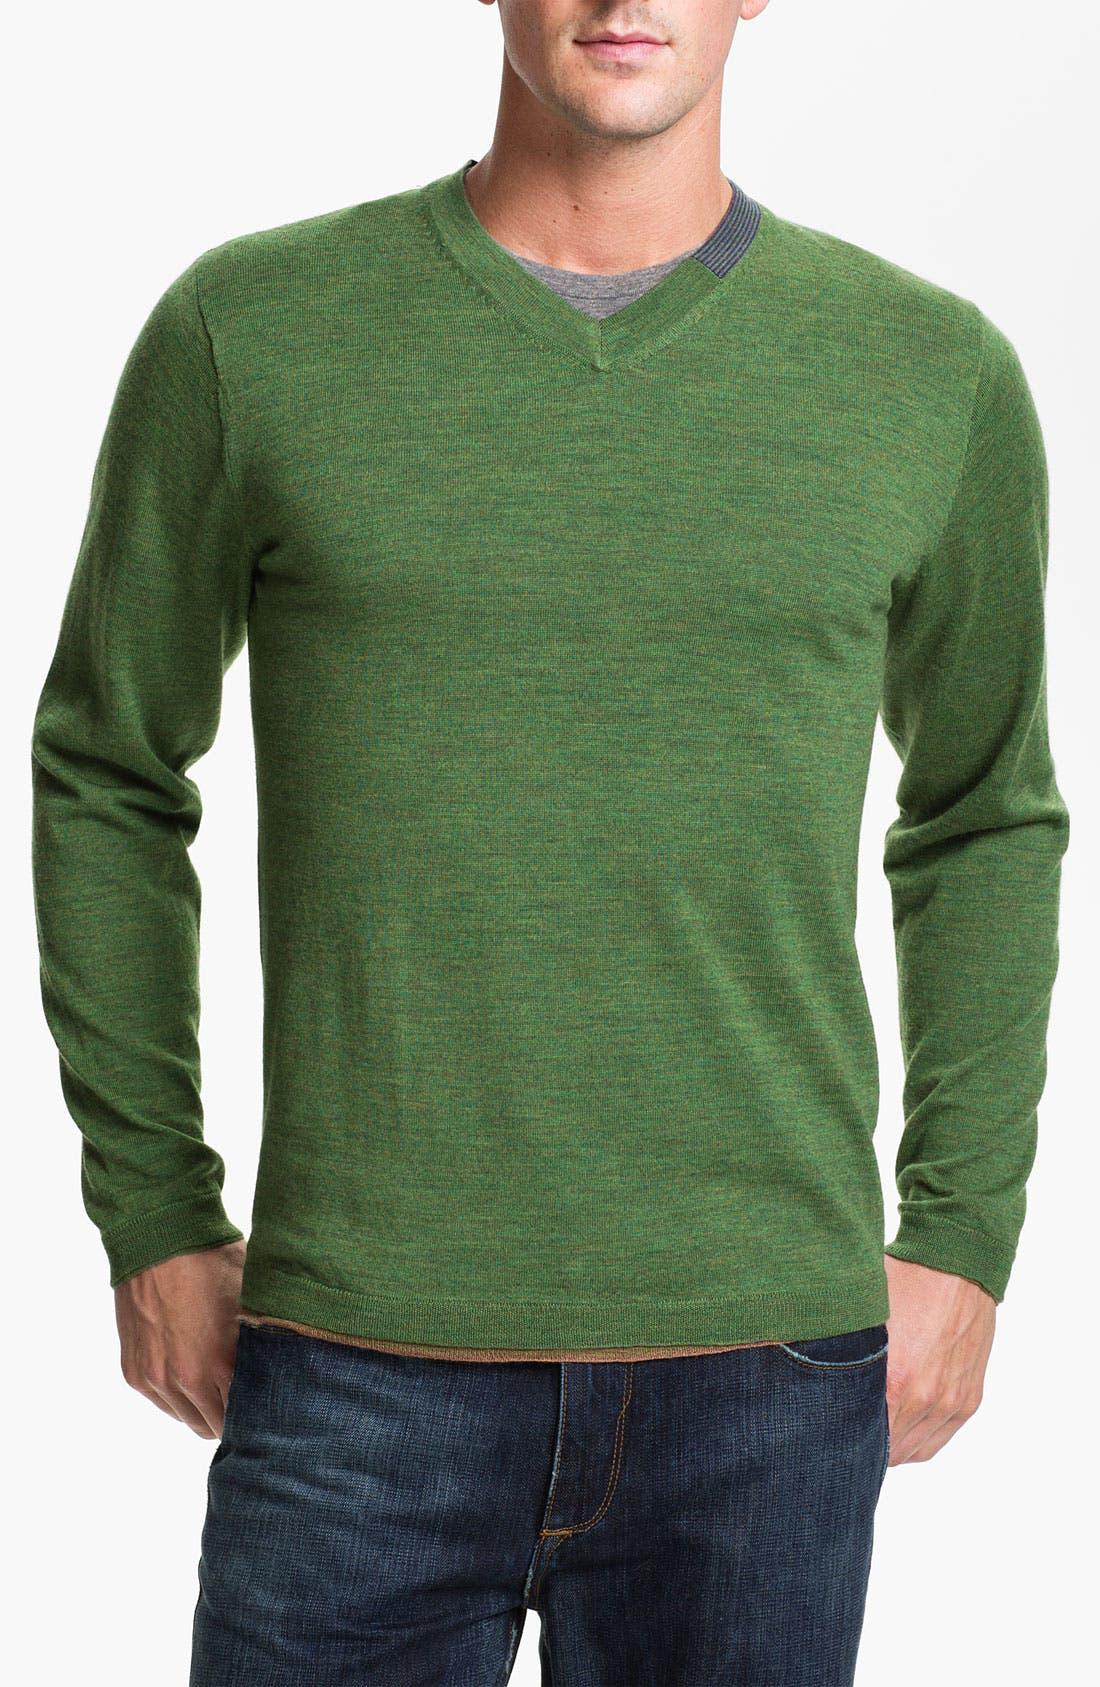 Alternate Image 1 Selected - Robert Graham 'Forest' V-Neck Wool Sweater